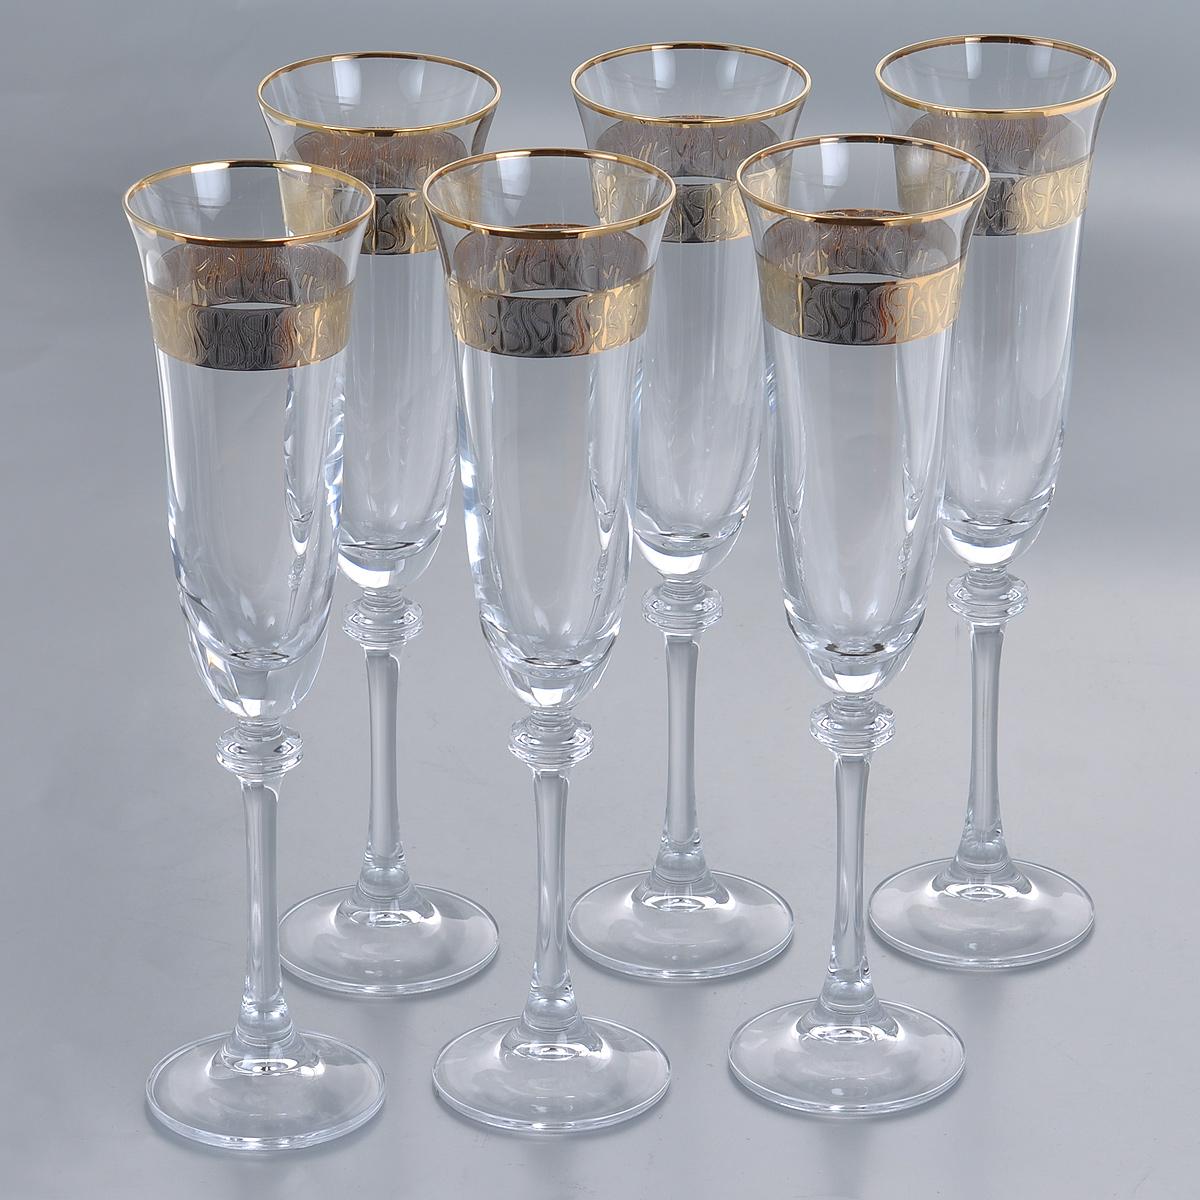 Набор бокалов для шампанского Crystalite Bohemia Александра, цвет: золотистый, 190 мл, 6 шт набор бокалов для бренди 6 шт crystalite bohemia набор бокалов для бренди 6 шт